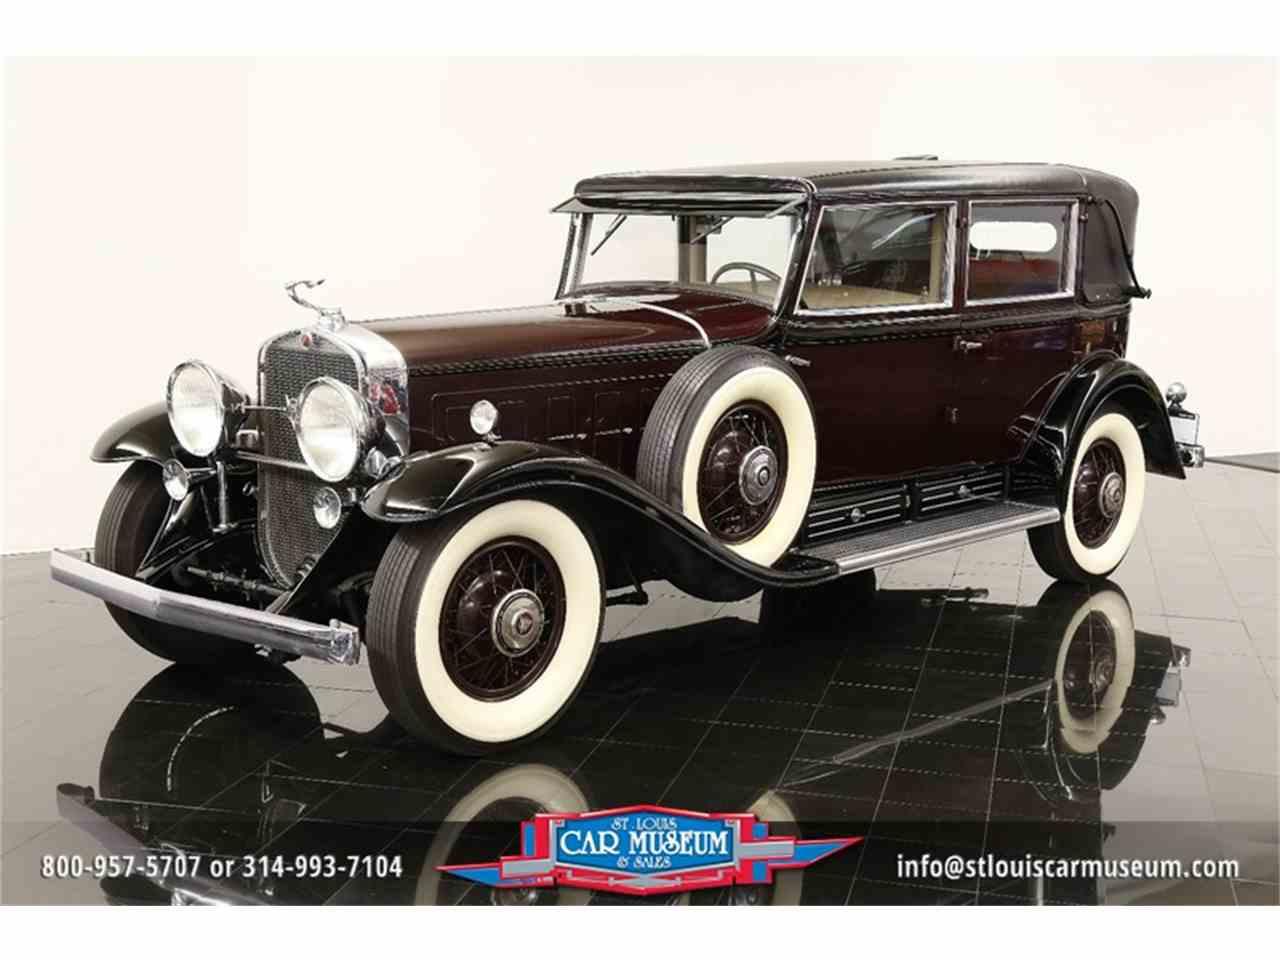 Large Picture of Classic '31 Cadillac V-16 Madam X Landau Sedan located in Missouri - $374,900.00 - JSU3